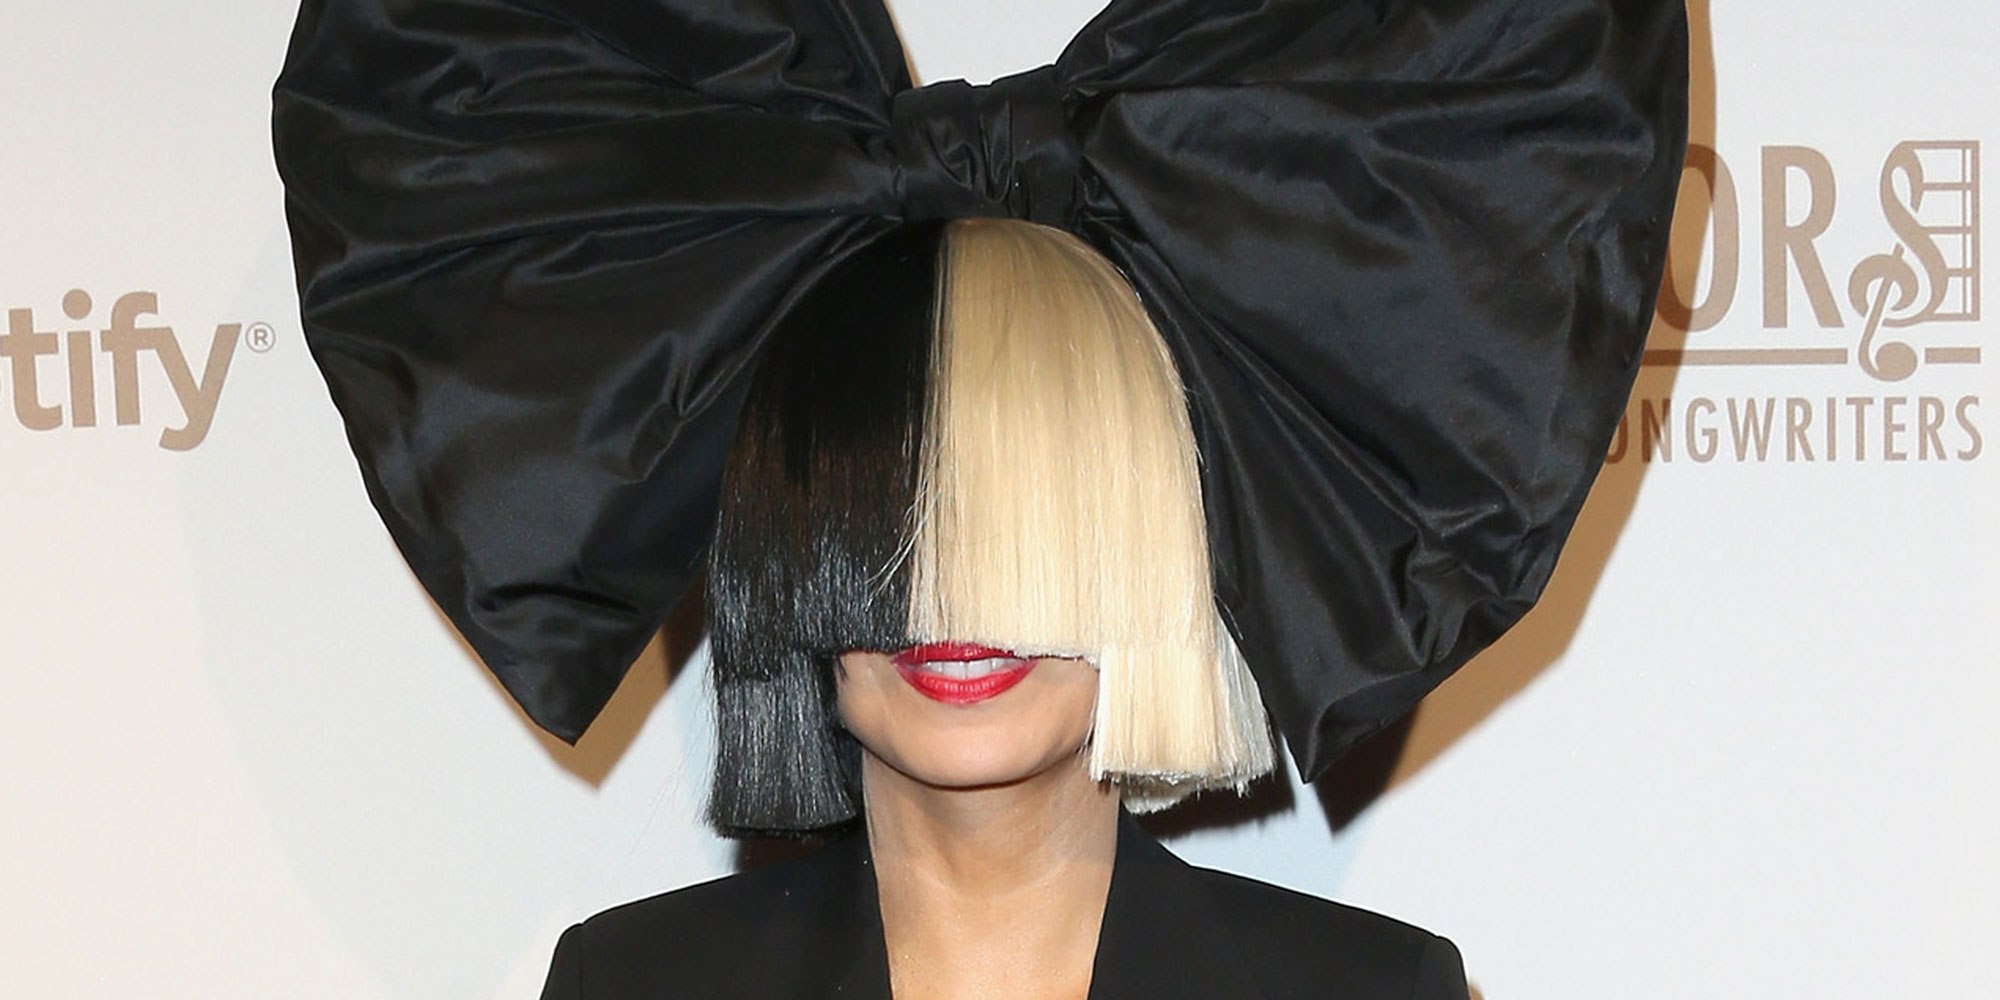 Sia ปฏิเสธถ่ายภาพกับทรัมพ์เพื่อแสดงความเป็นหนึ่งกับแฟนๆเพศทางเลือก ...